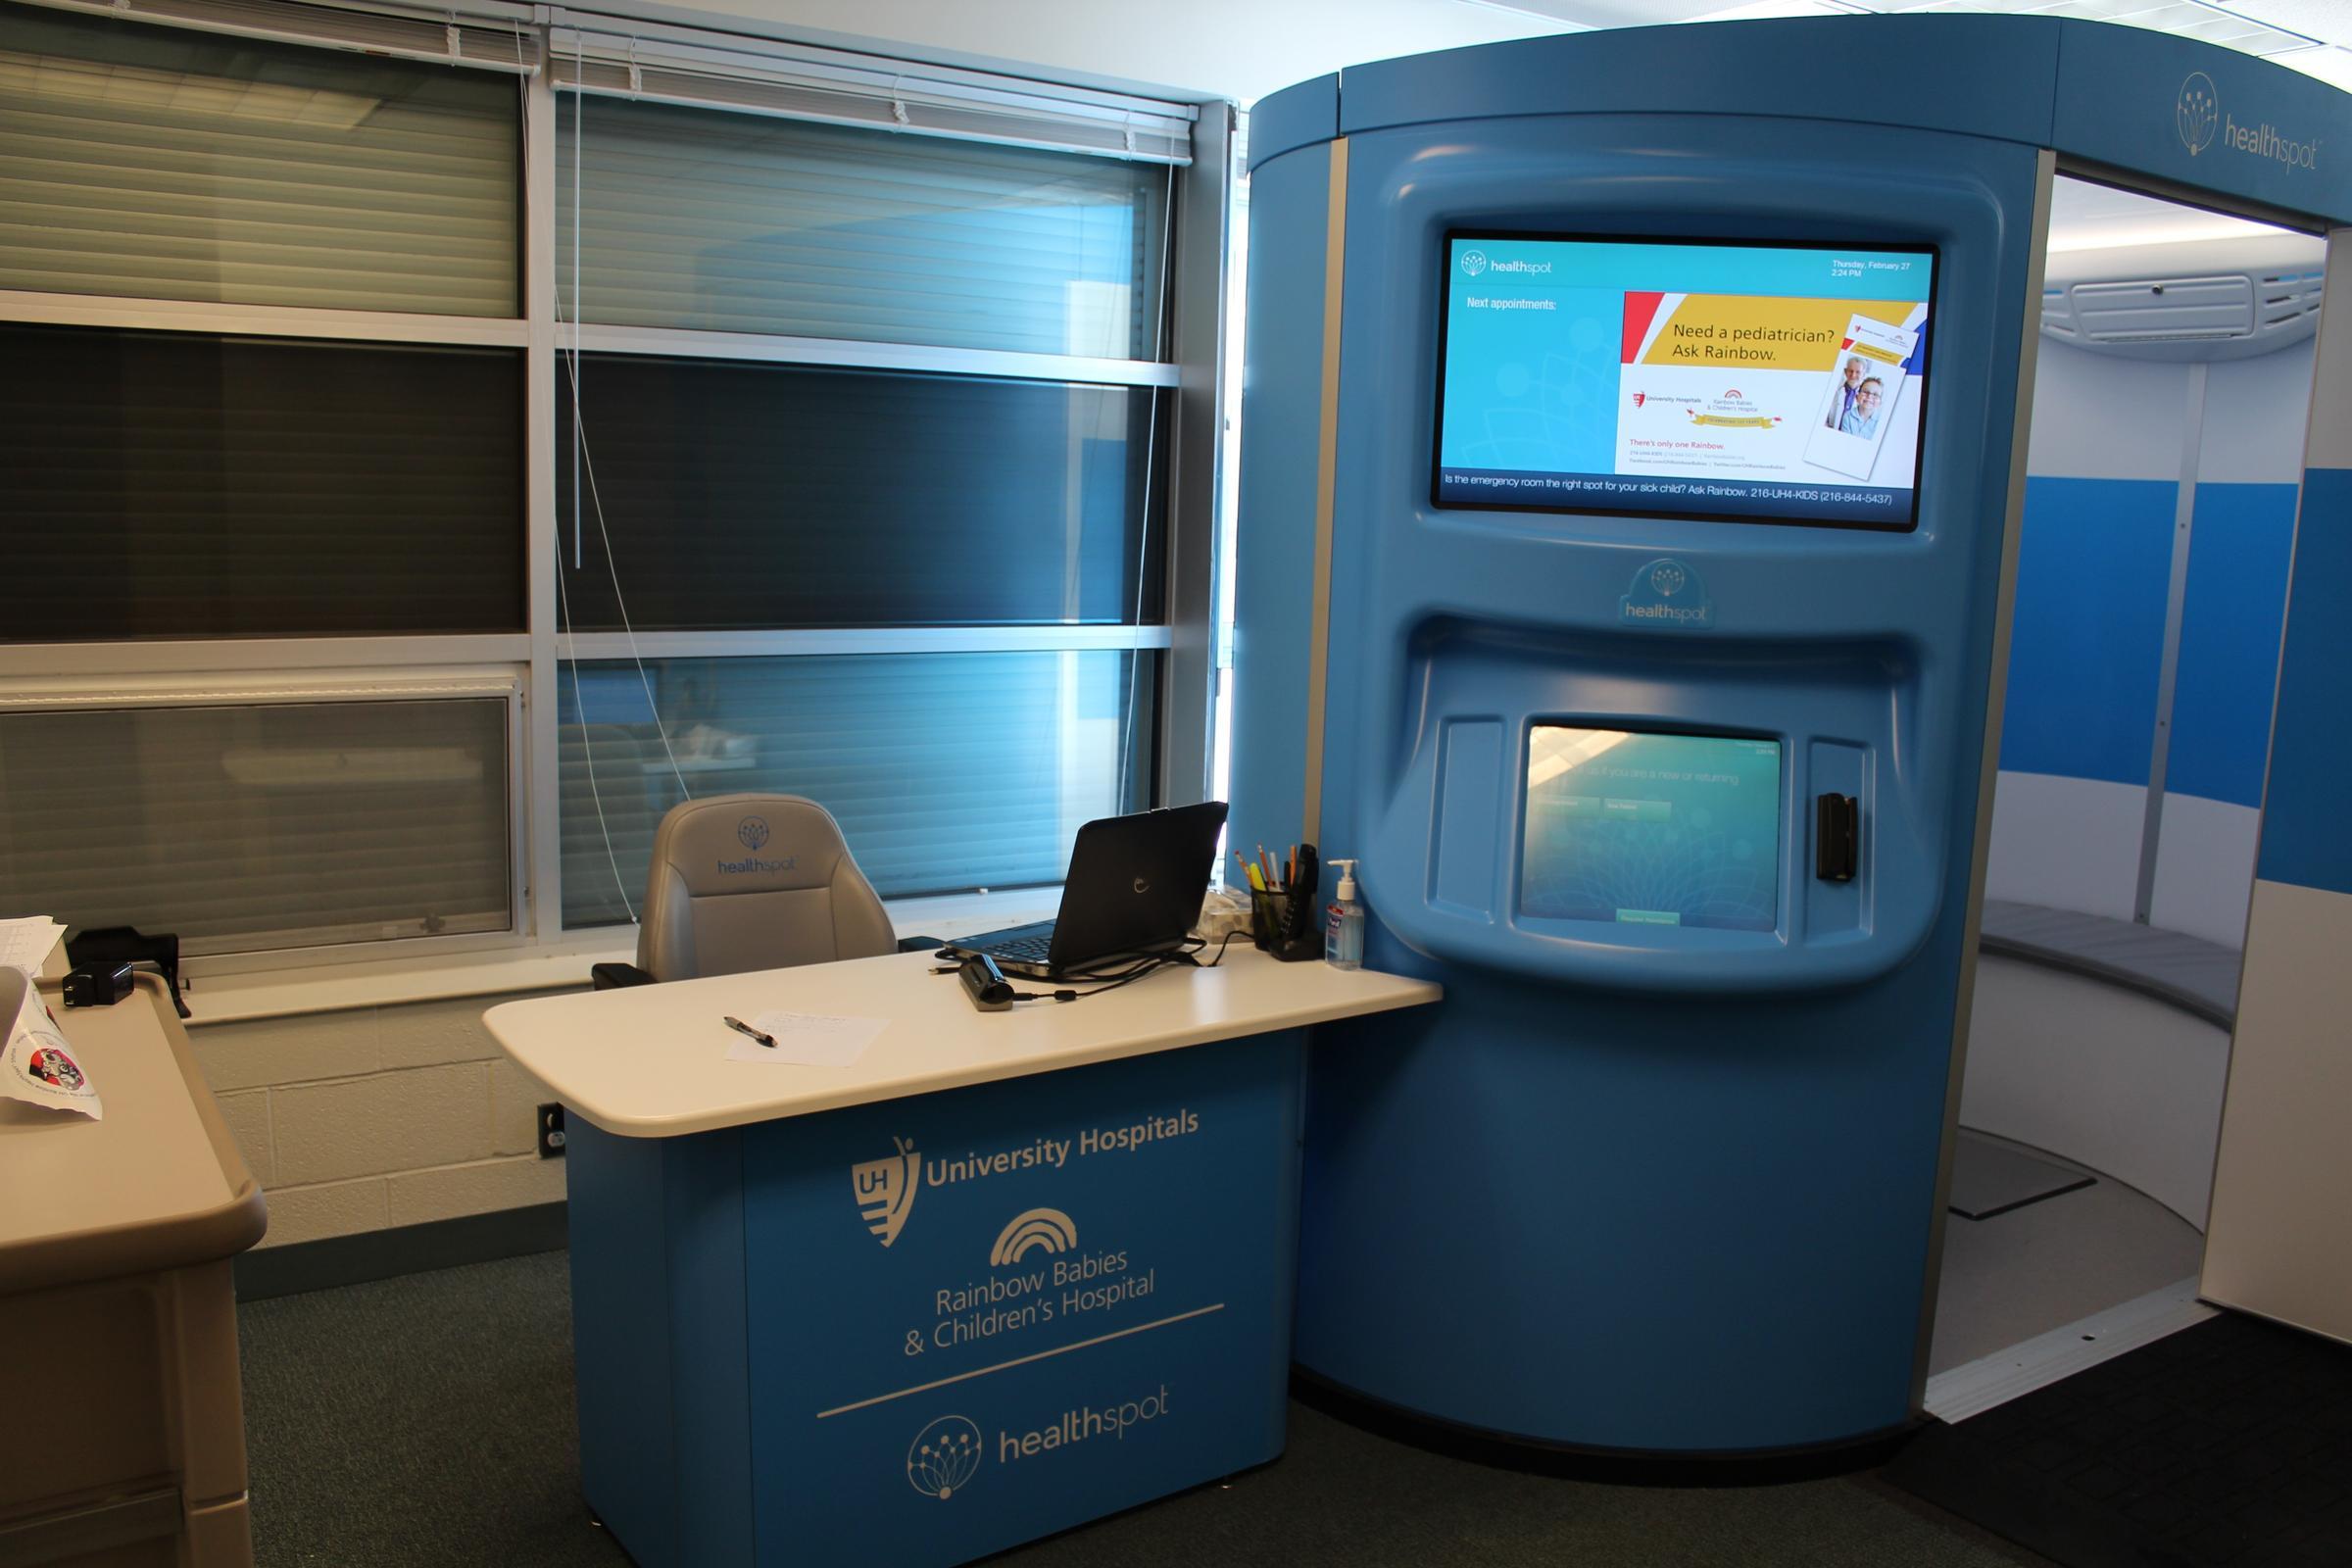 Virtual Kiosks Take Care Outside Clinics | WUSF News